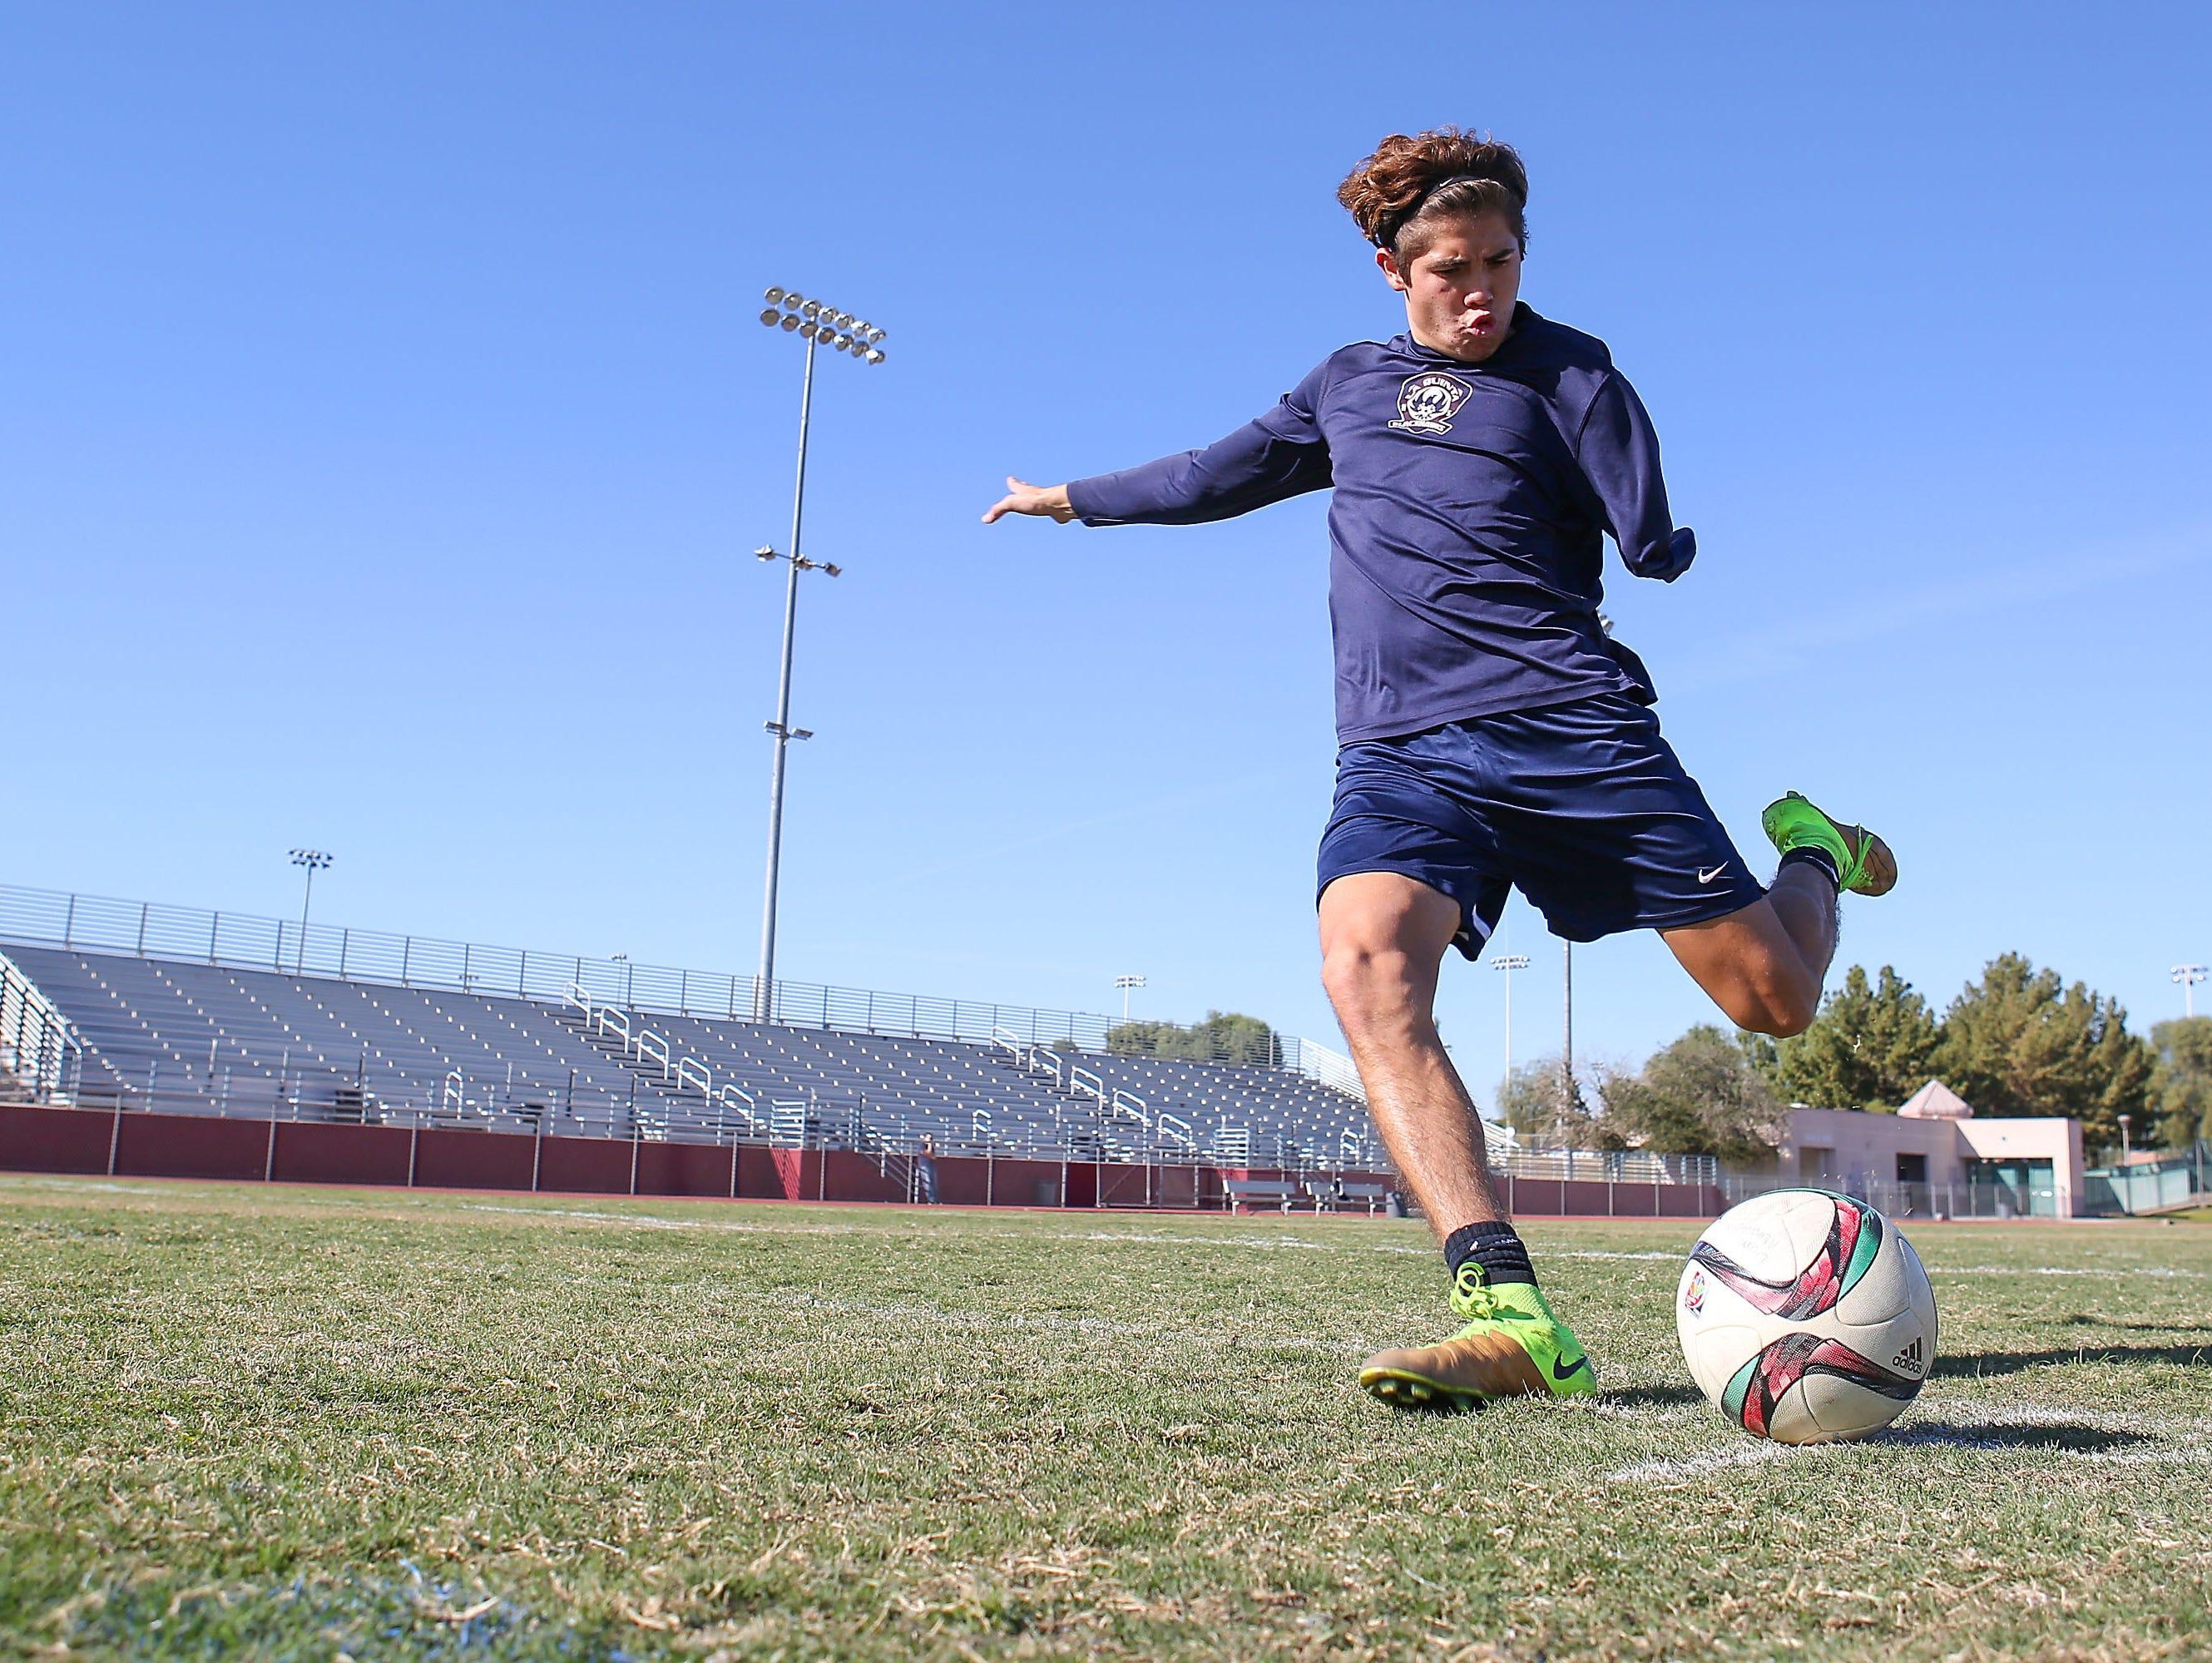 Lucas Rosales is a senior soccer player at La Quinta High School, November 22, 2016.